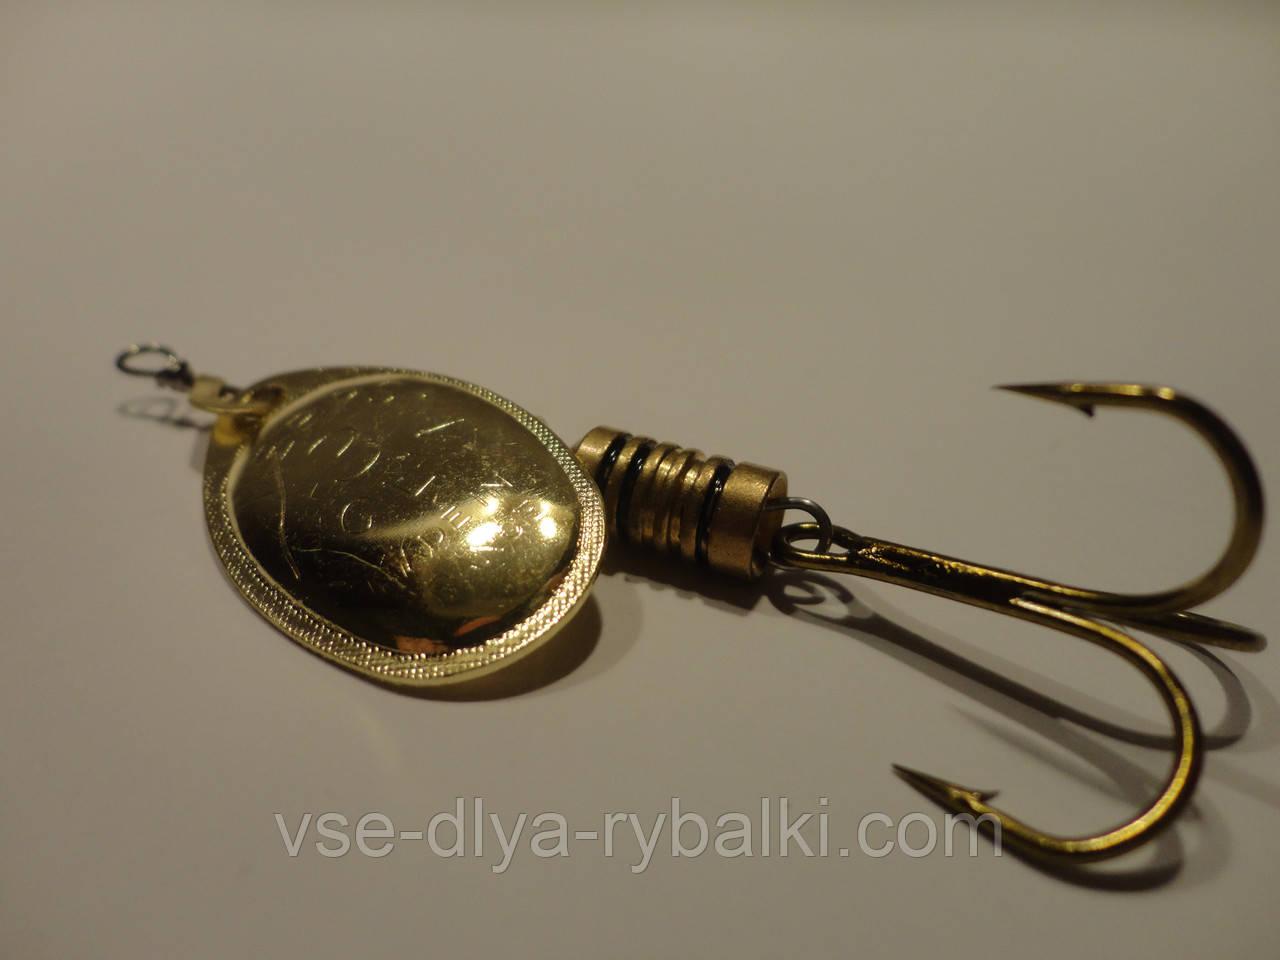 Вертушка mepps Aglia 3 (золото)